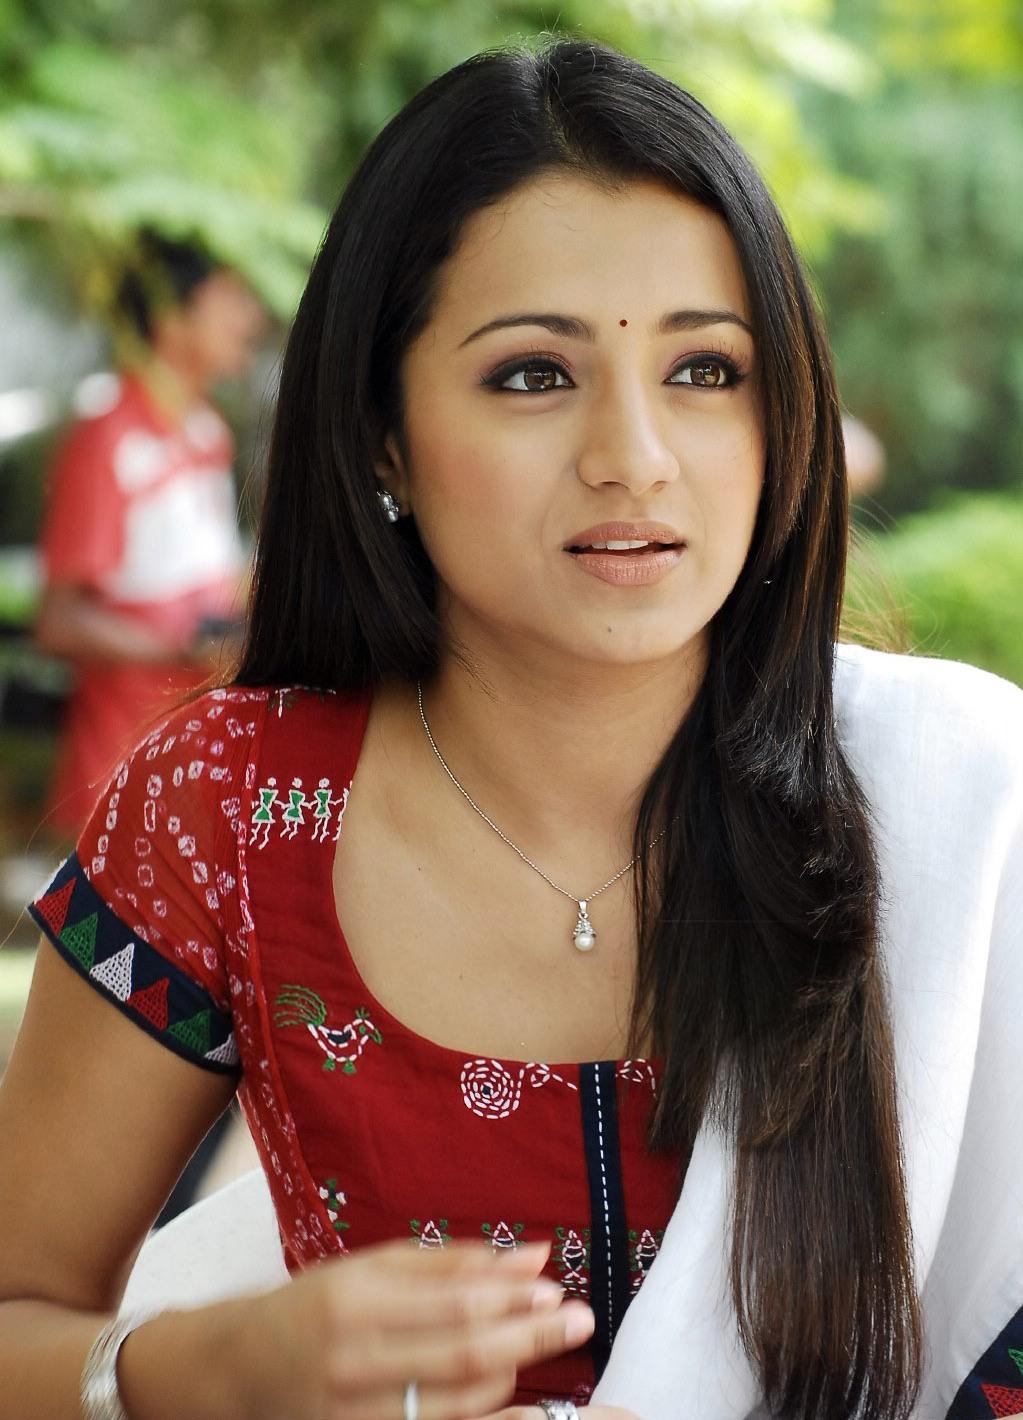 Trisha Krishnan New Look In Chudithar Cute Photogallery -1368